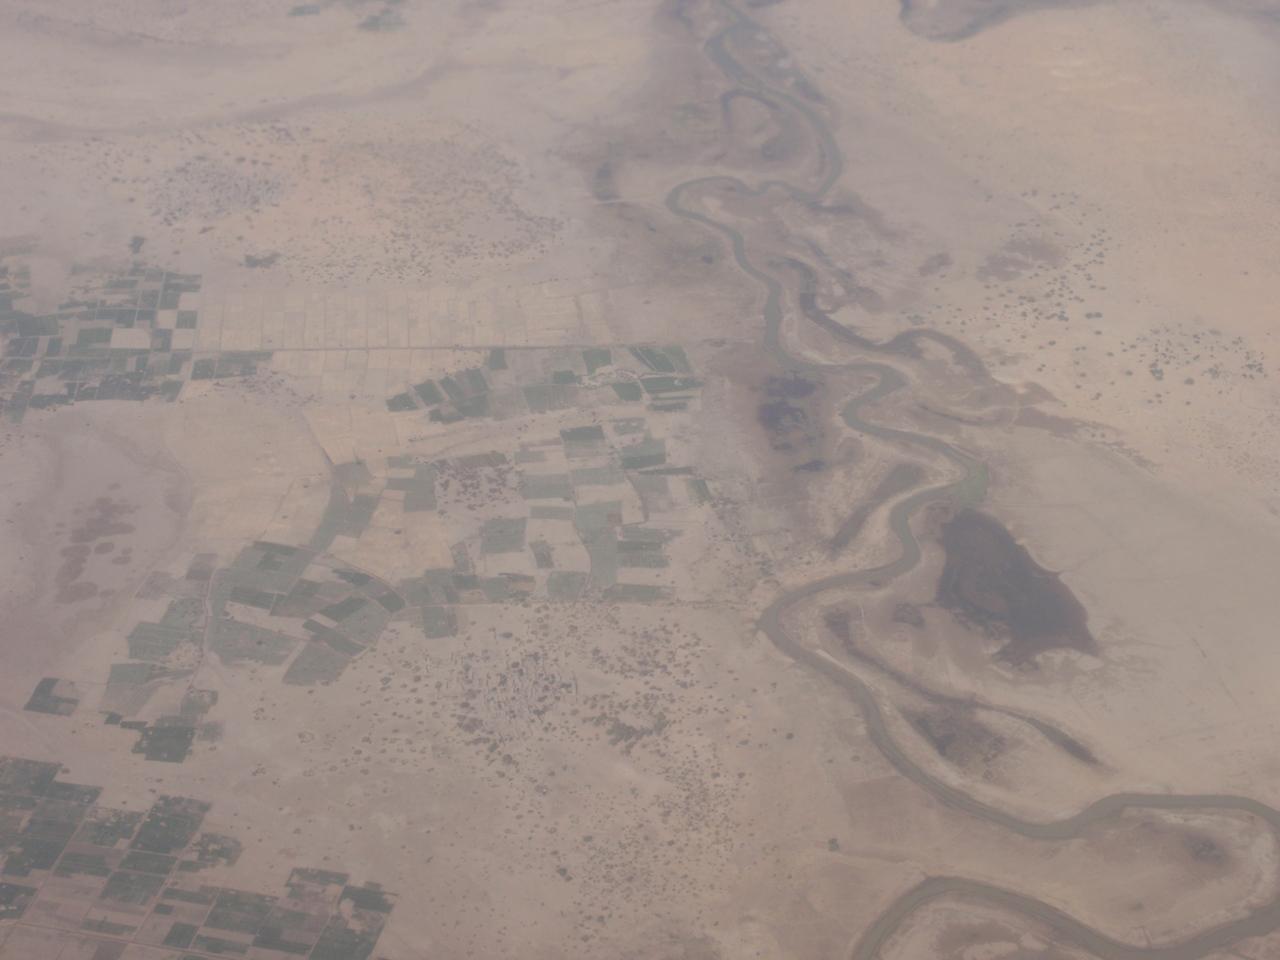 025_From the Dry Sahel Belt to the Unforgiving Sahara